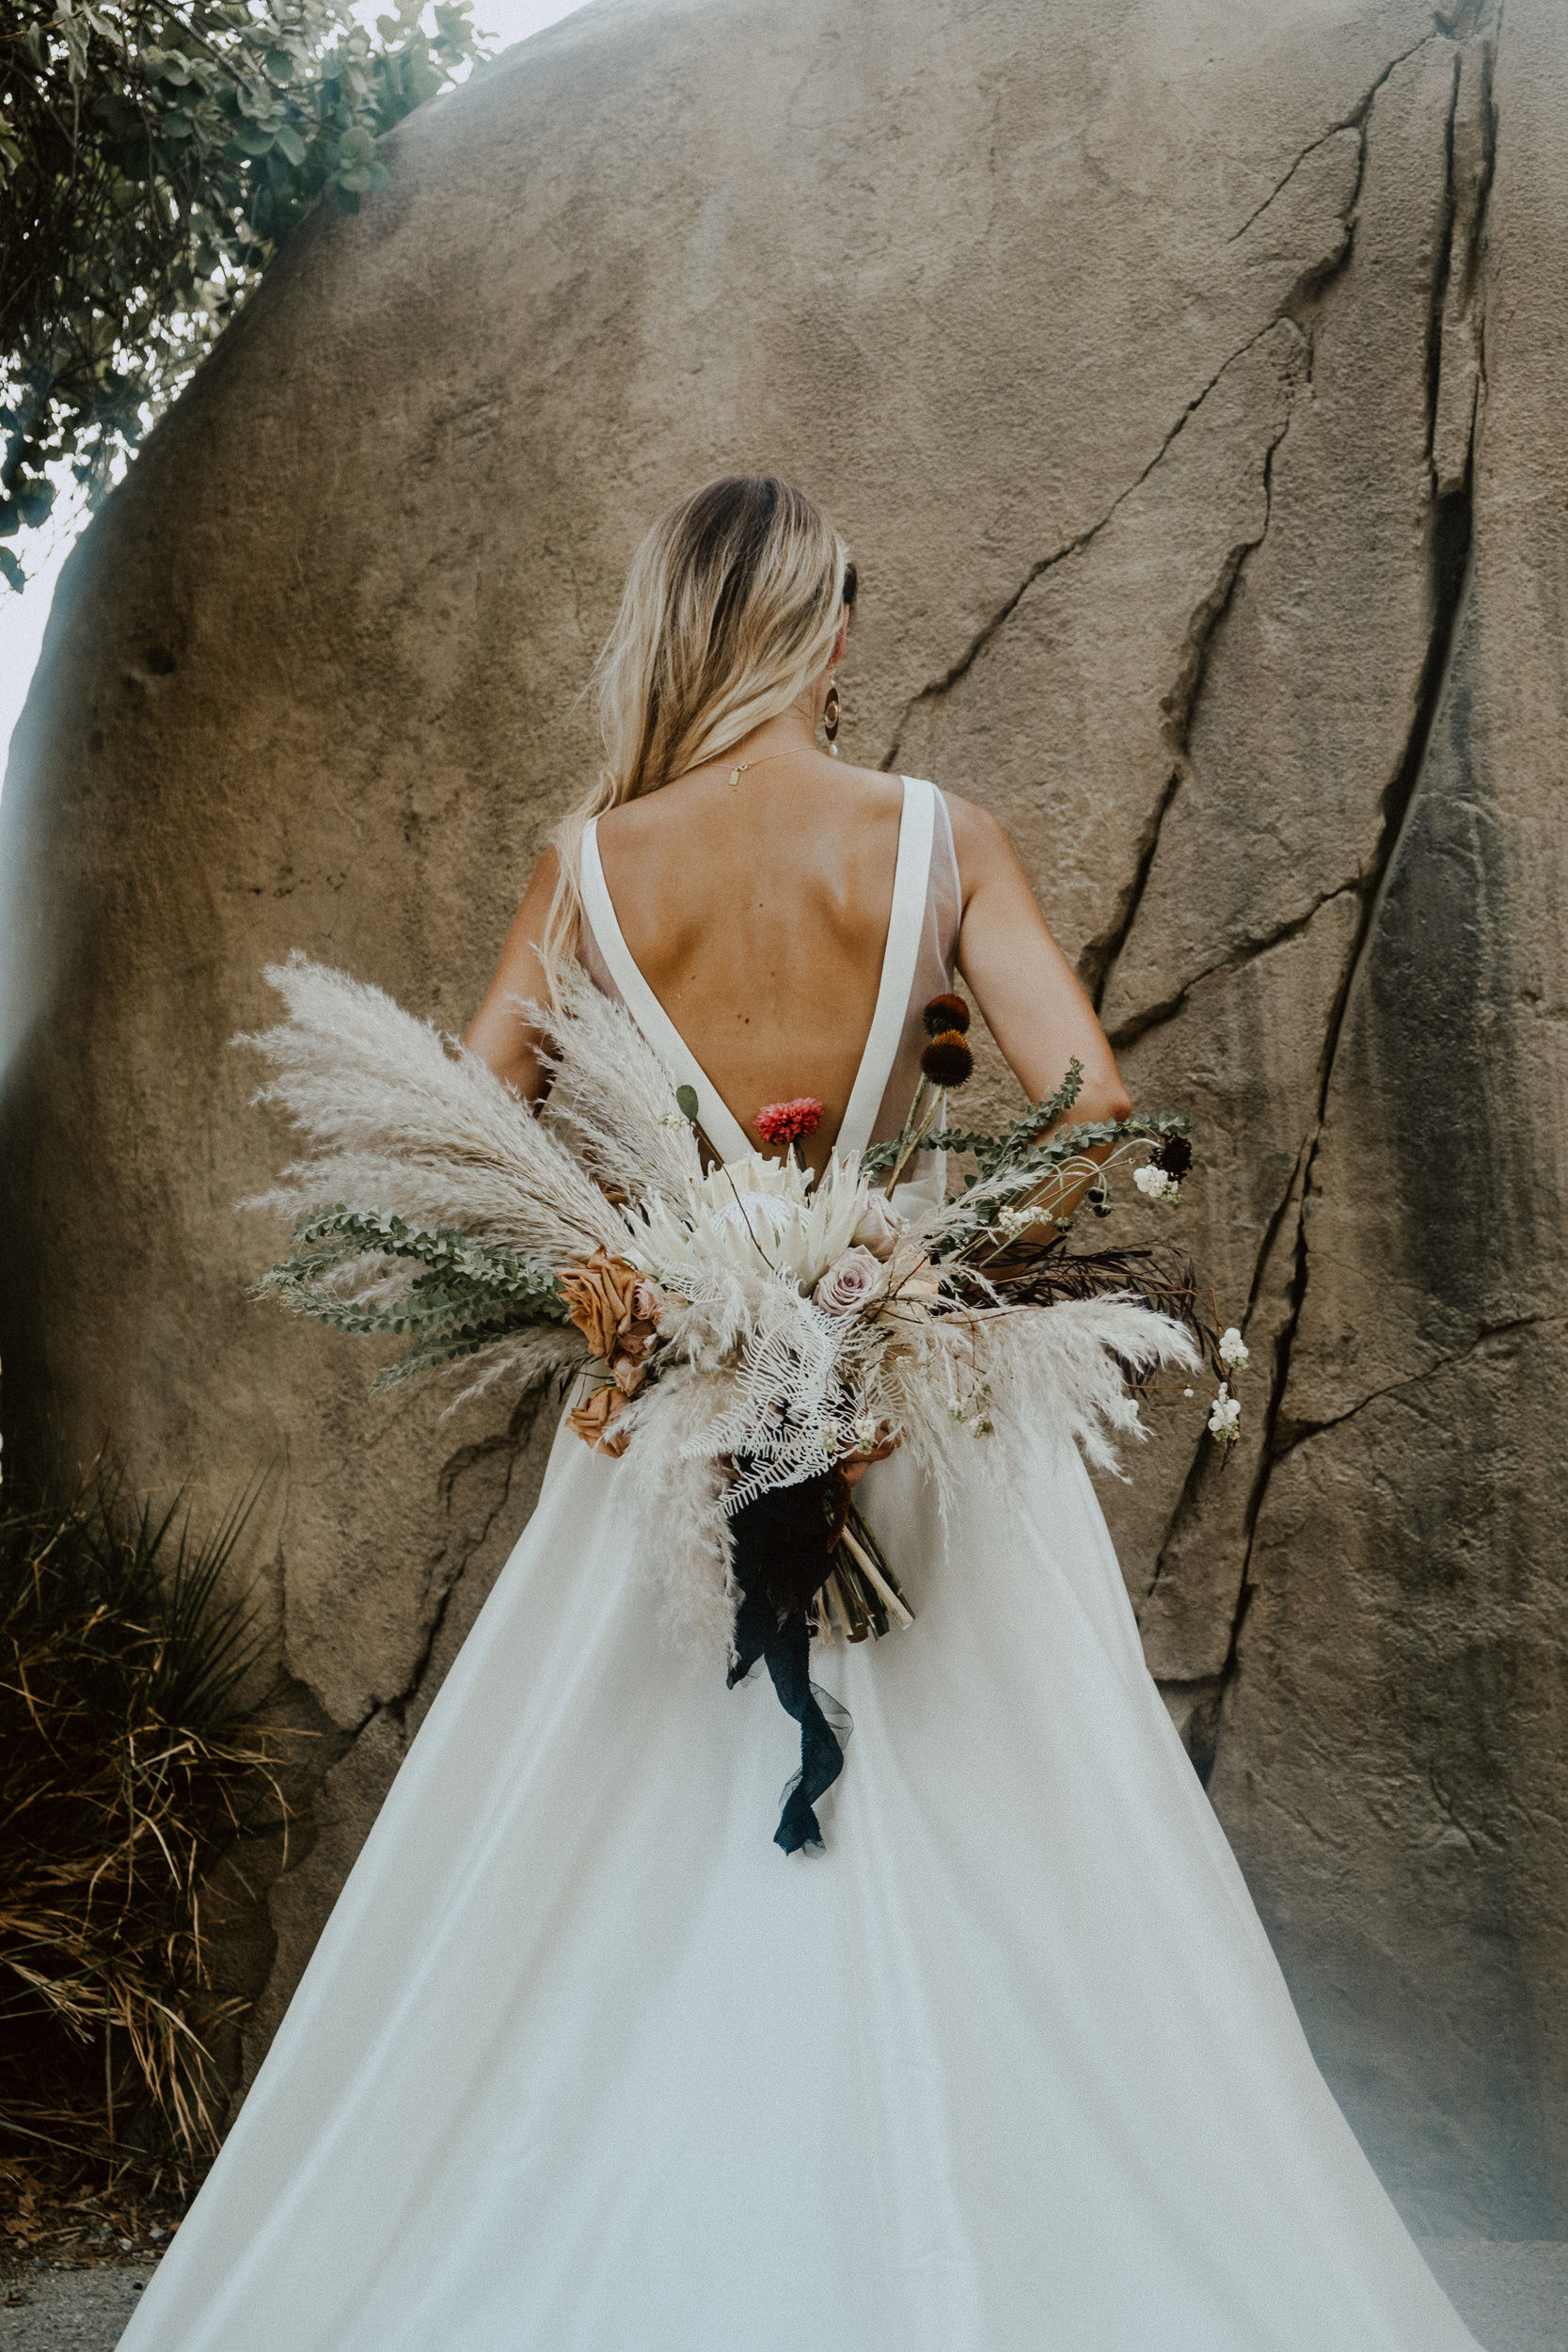 sChelsie + Chris - The Desert Shootout Wedding Romantics at The Living Desert-20.jpg